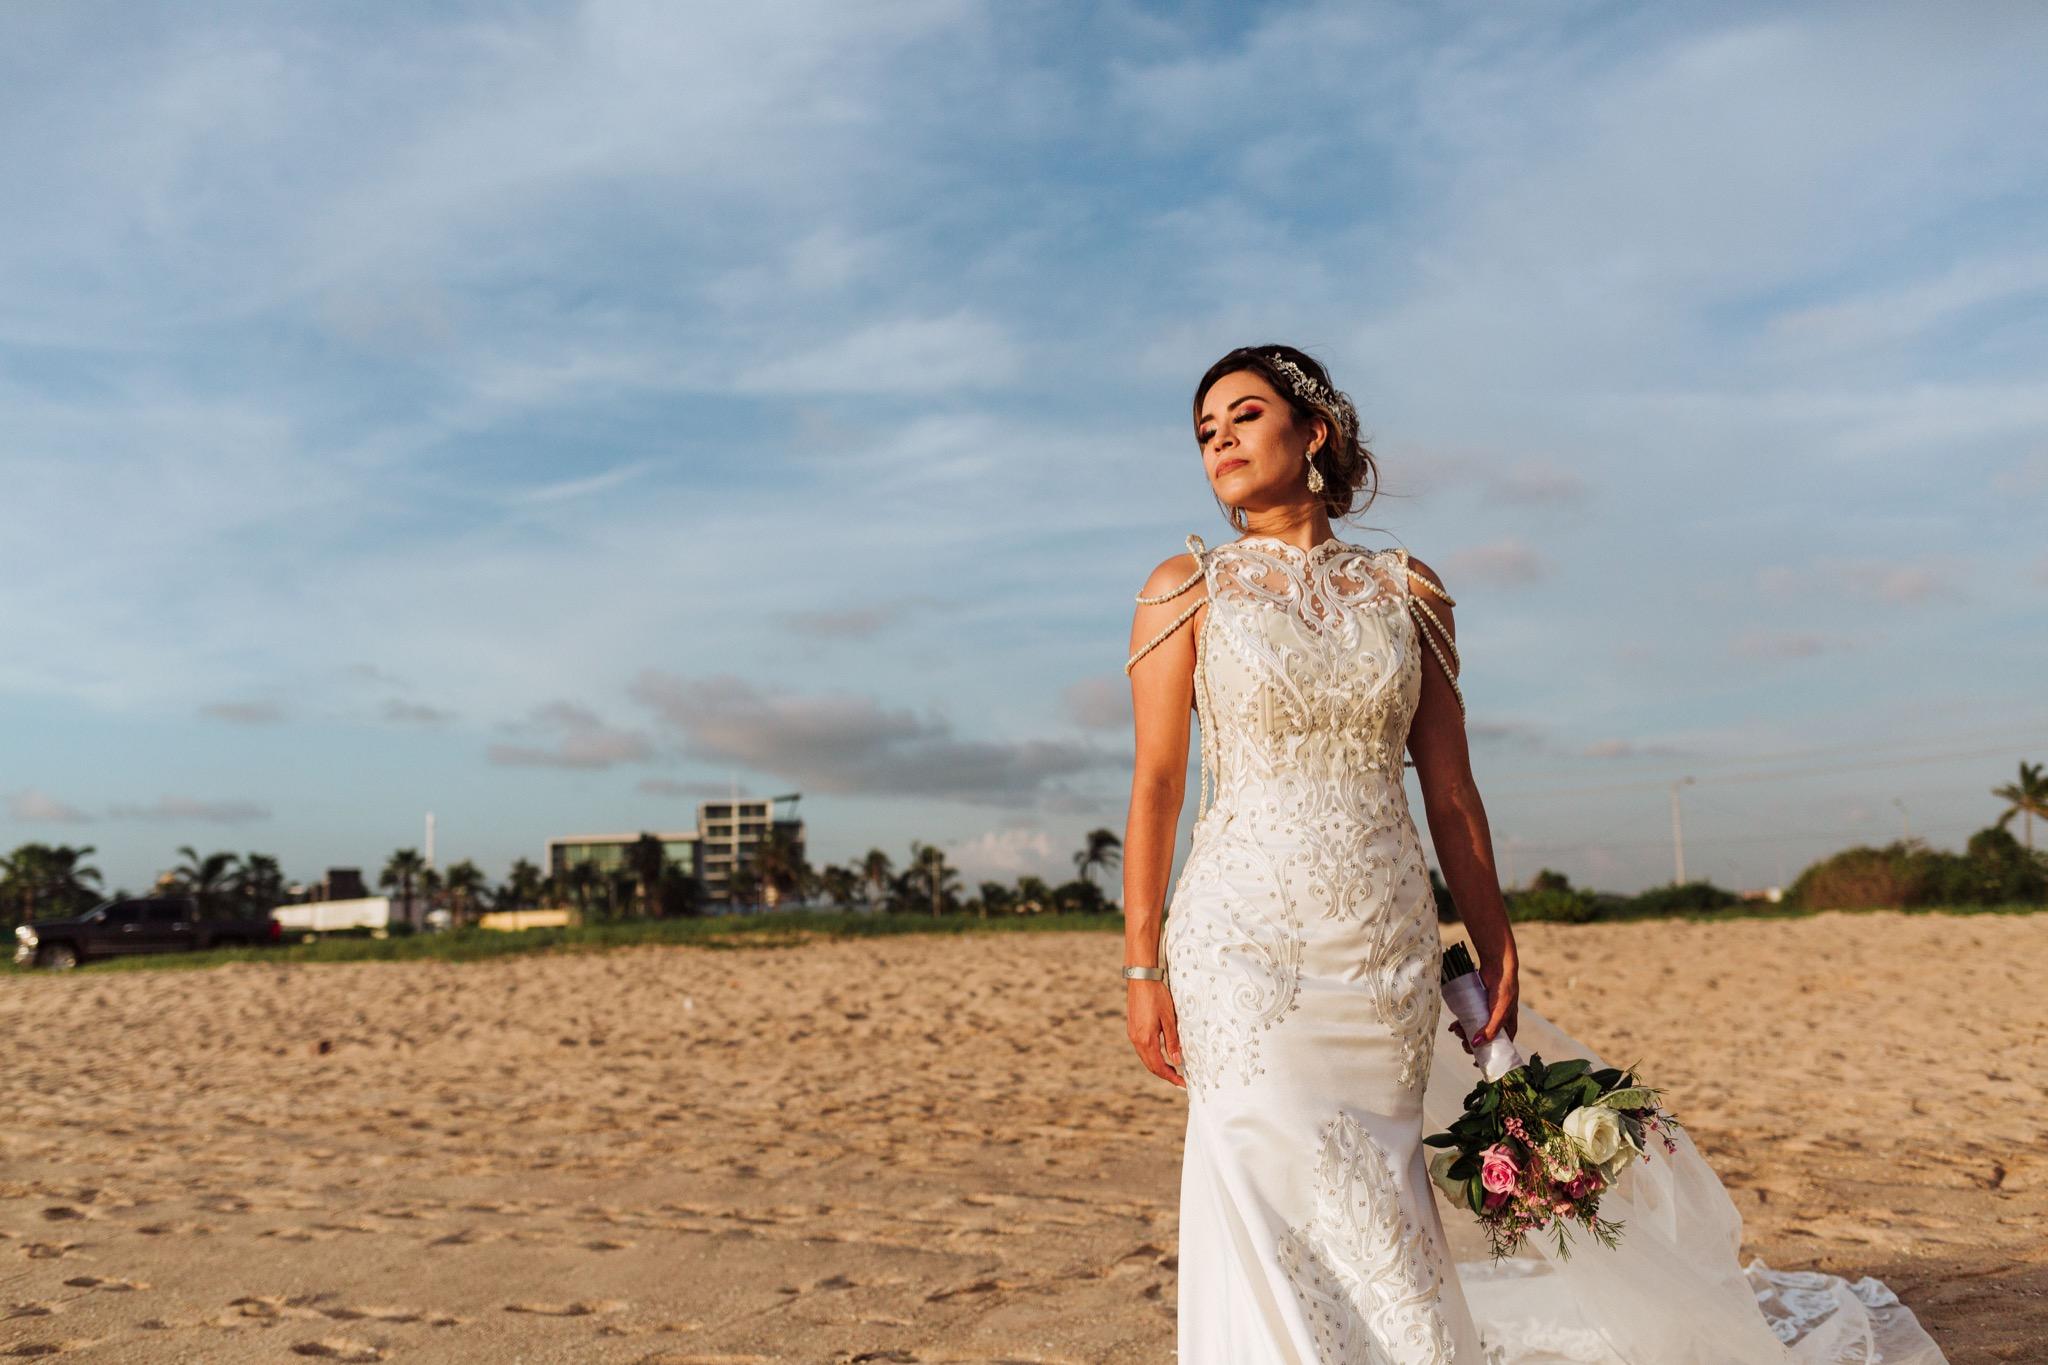 Javier_noriega_fotografo_bodas_profesional_zacatecas_mexico_mazatlan_sinaloa_photographer_weddings52